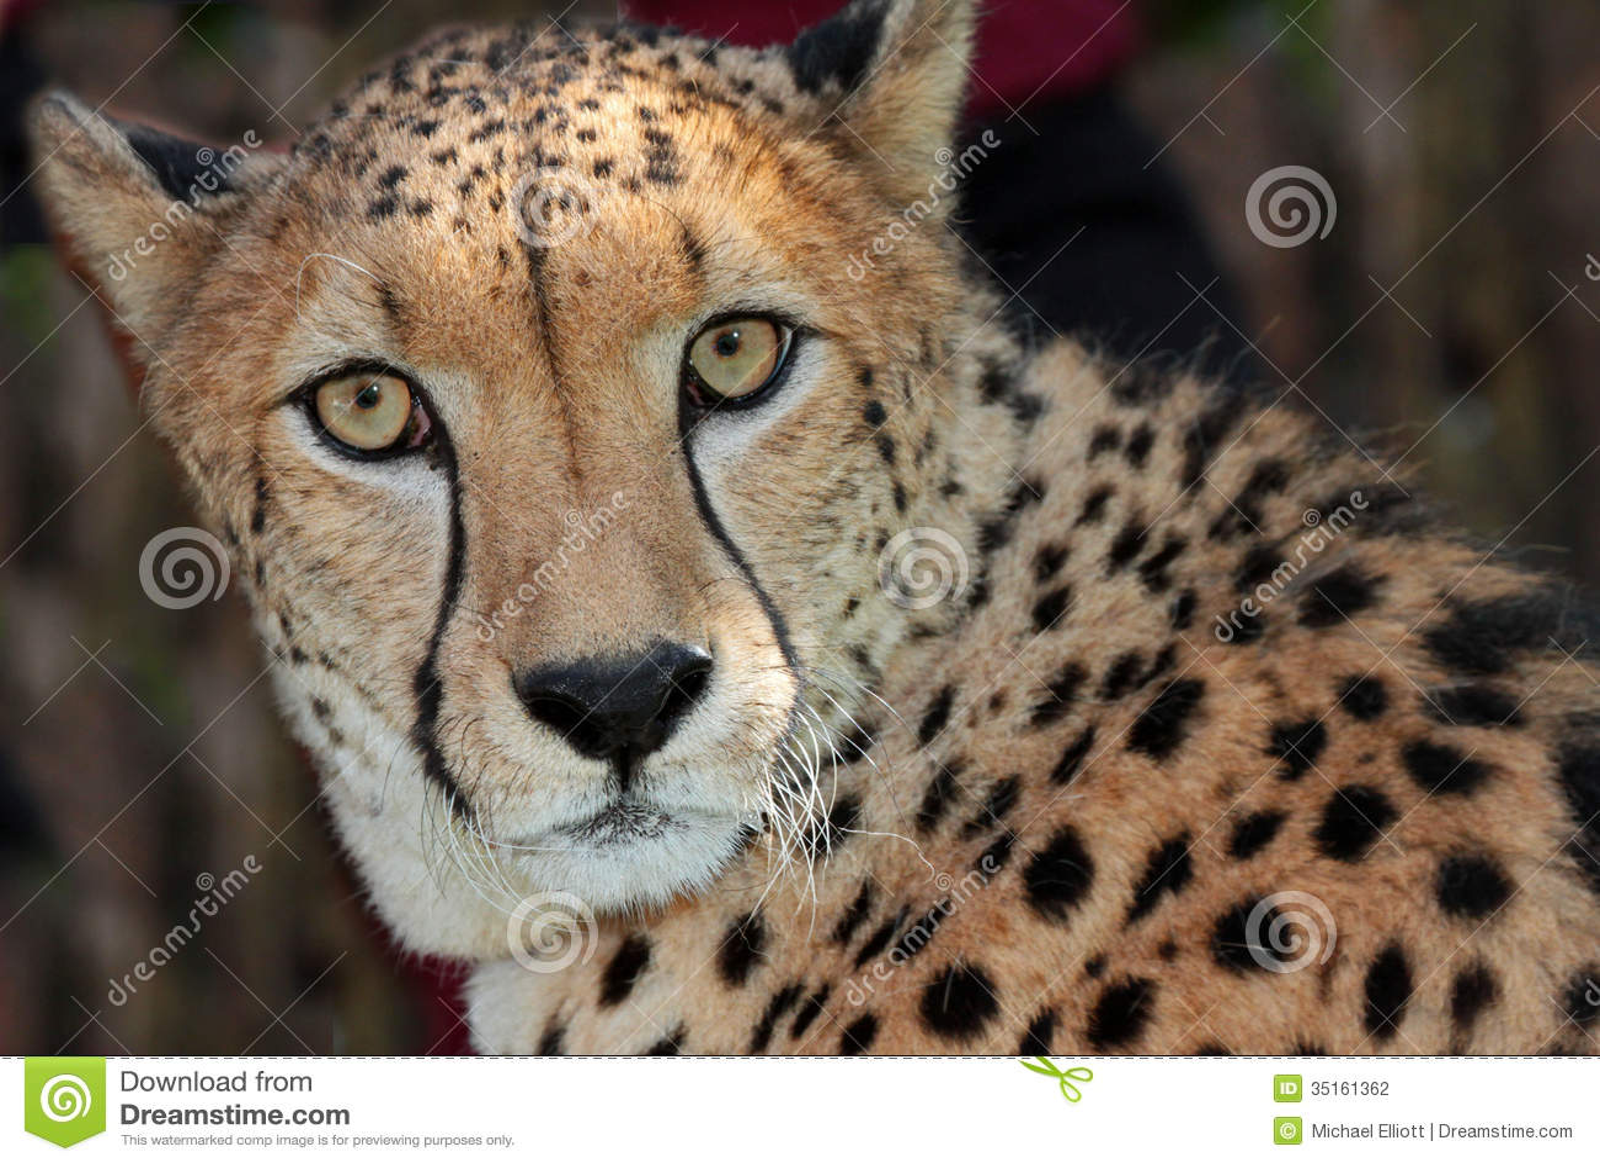 Brown Eye Close Up Cheetah Stock Photogra...